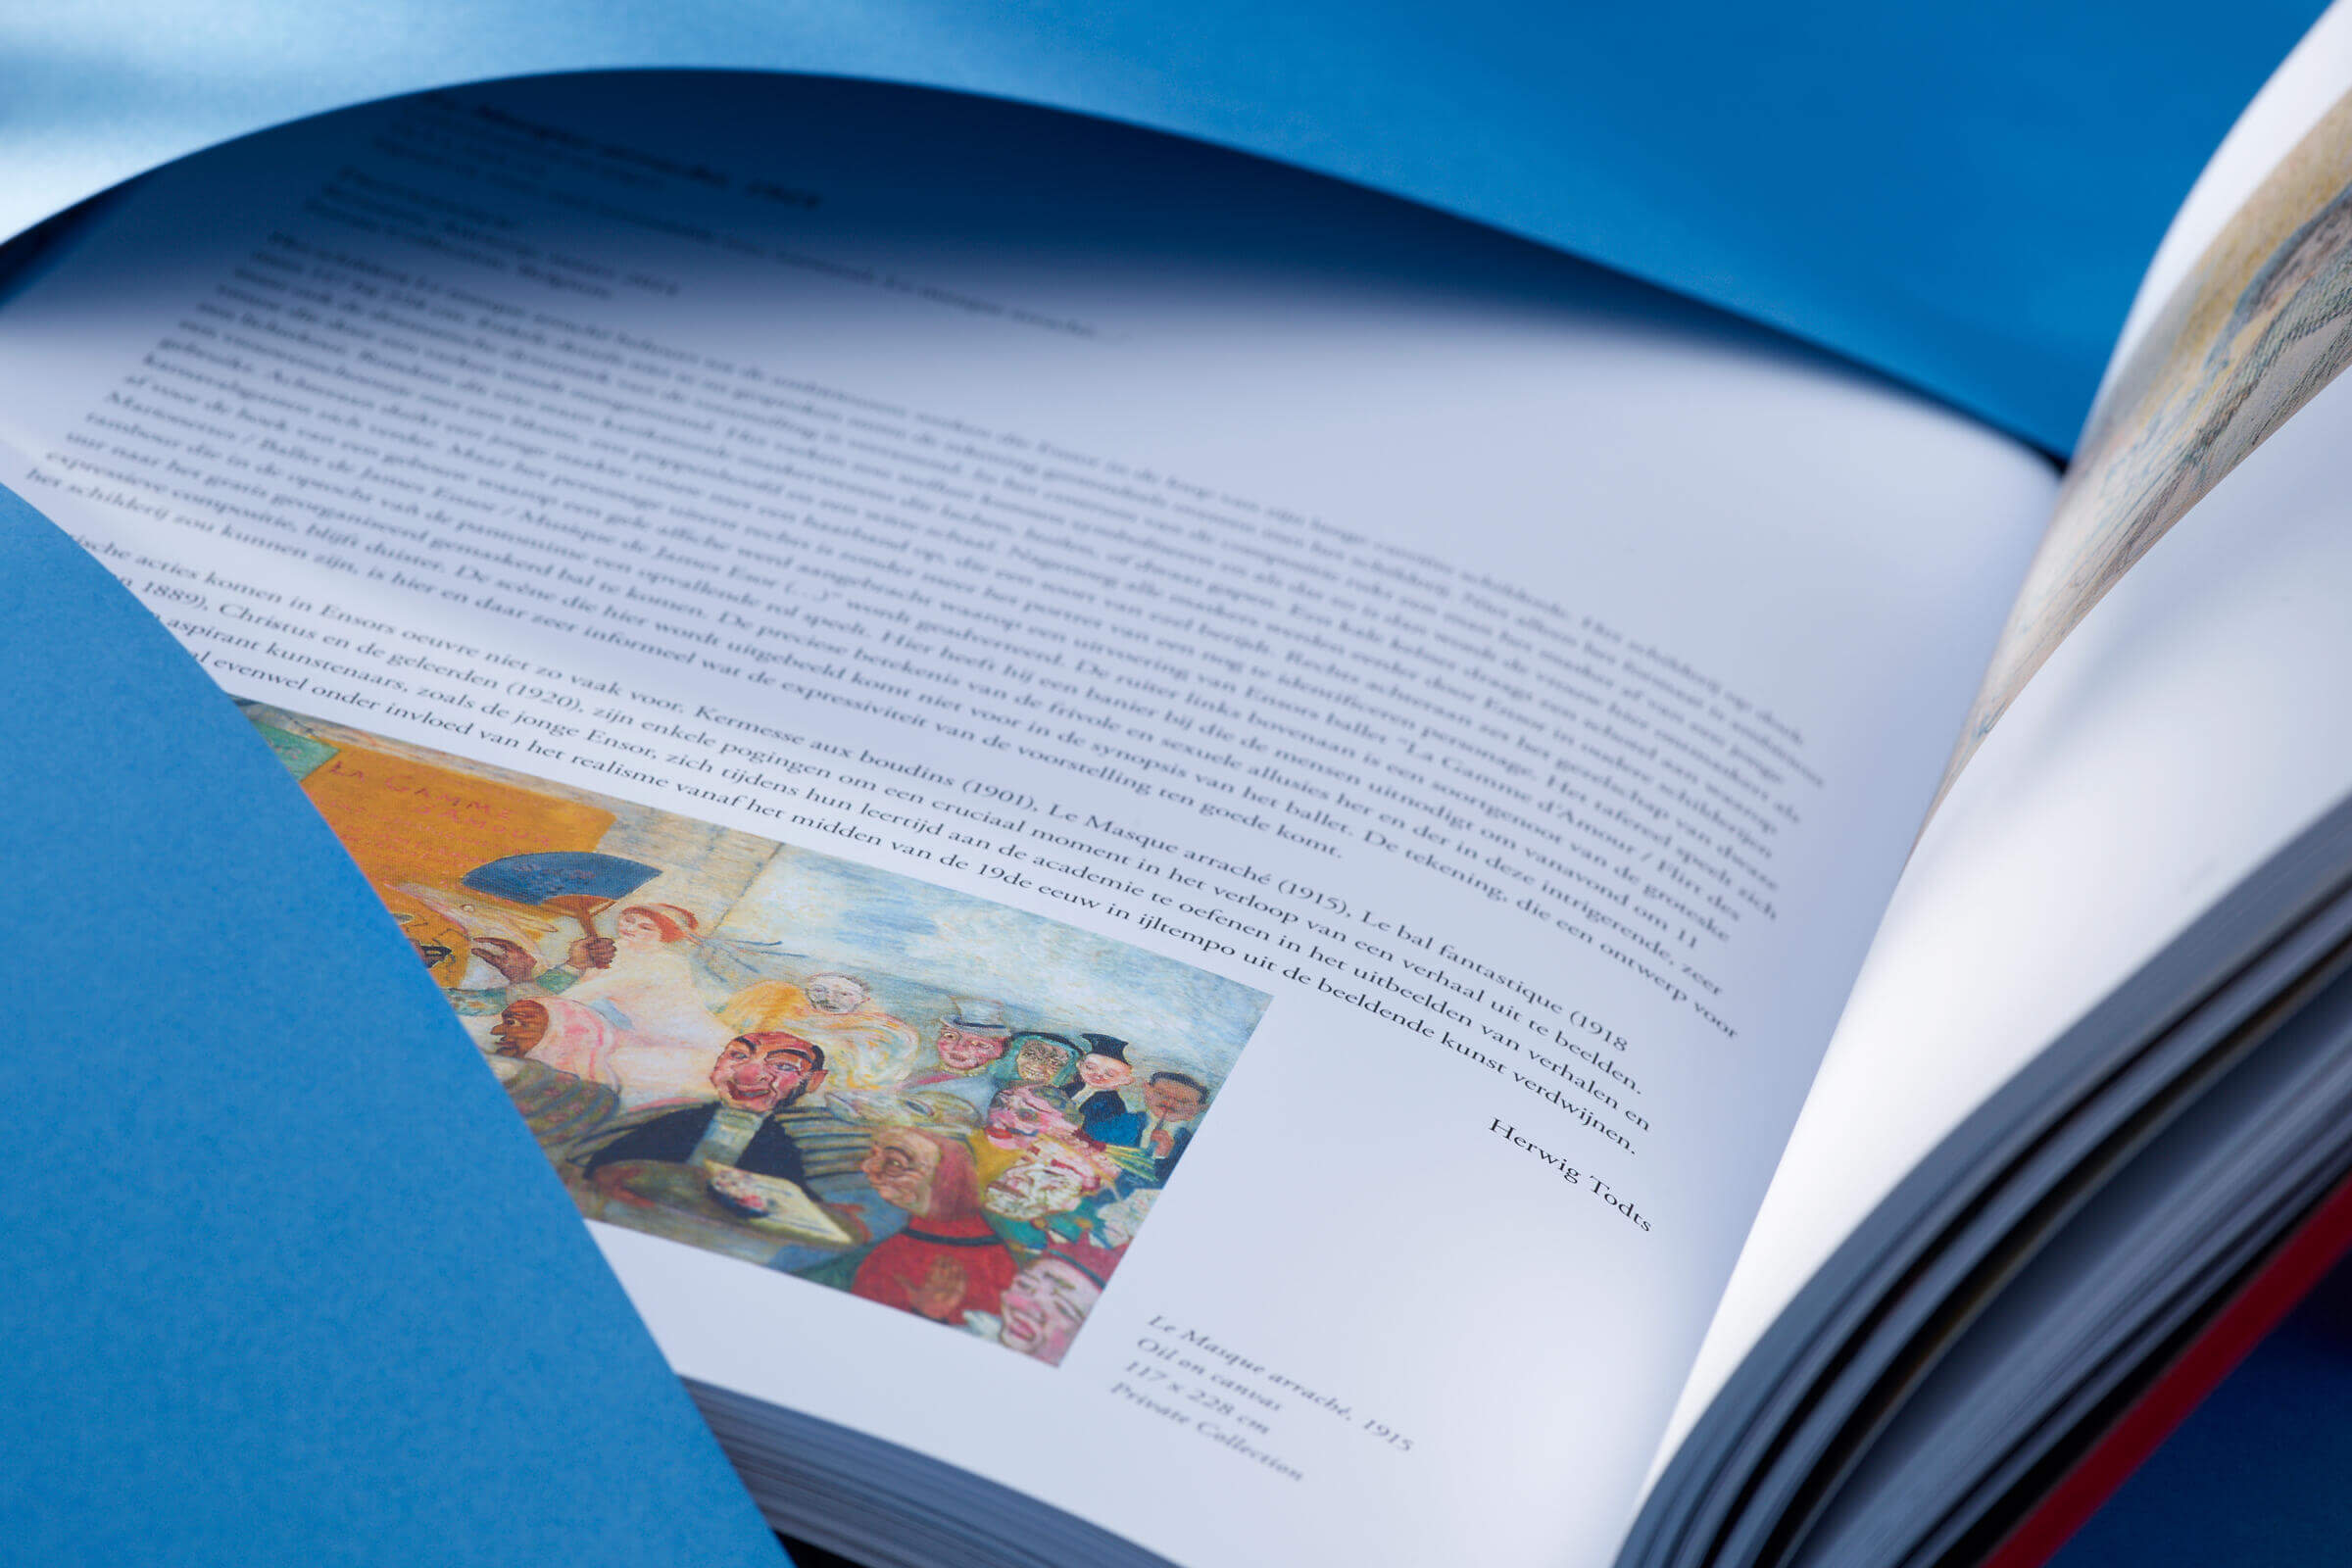 Binnenwerk kunstboek James Ensor